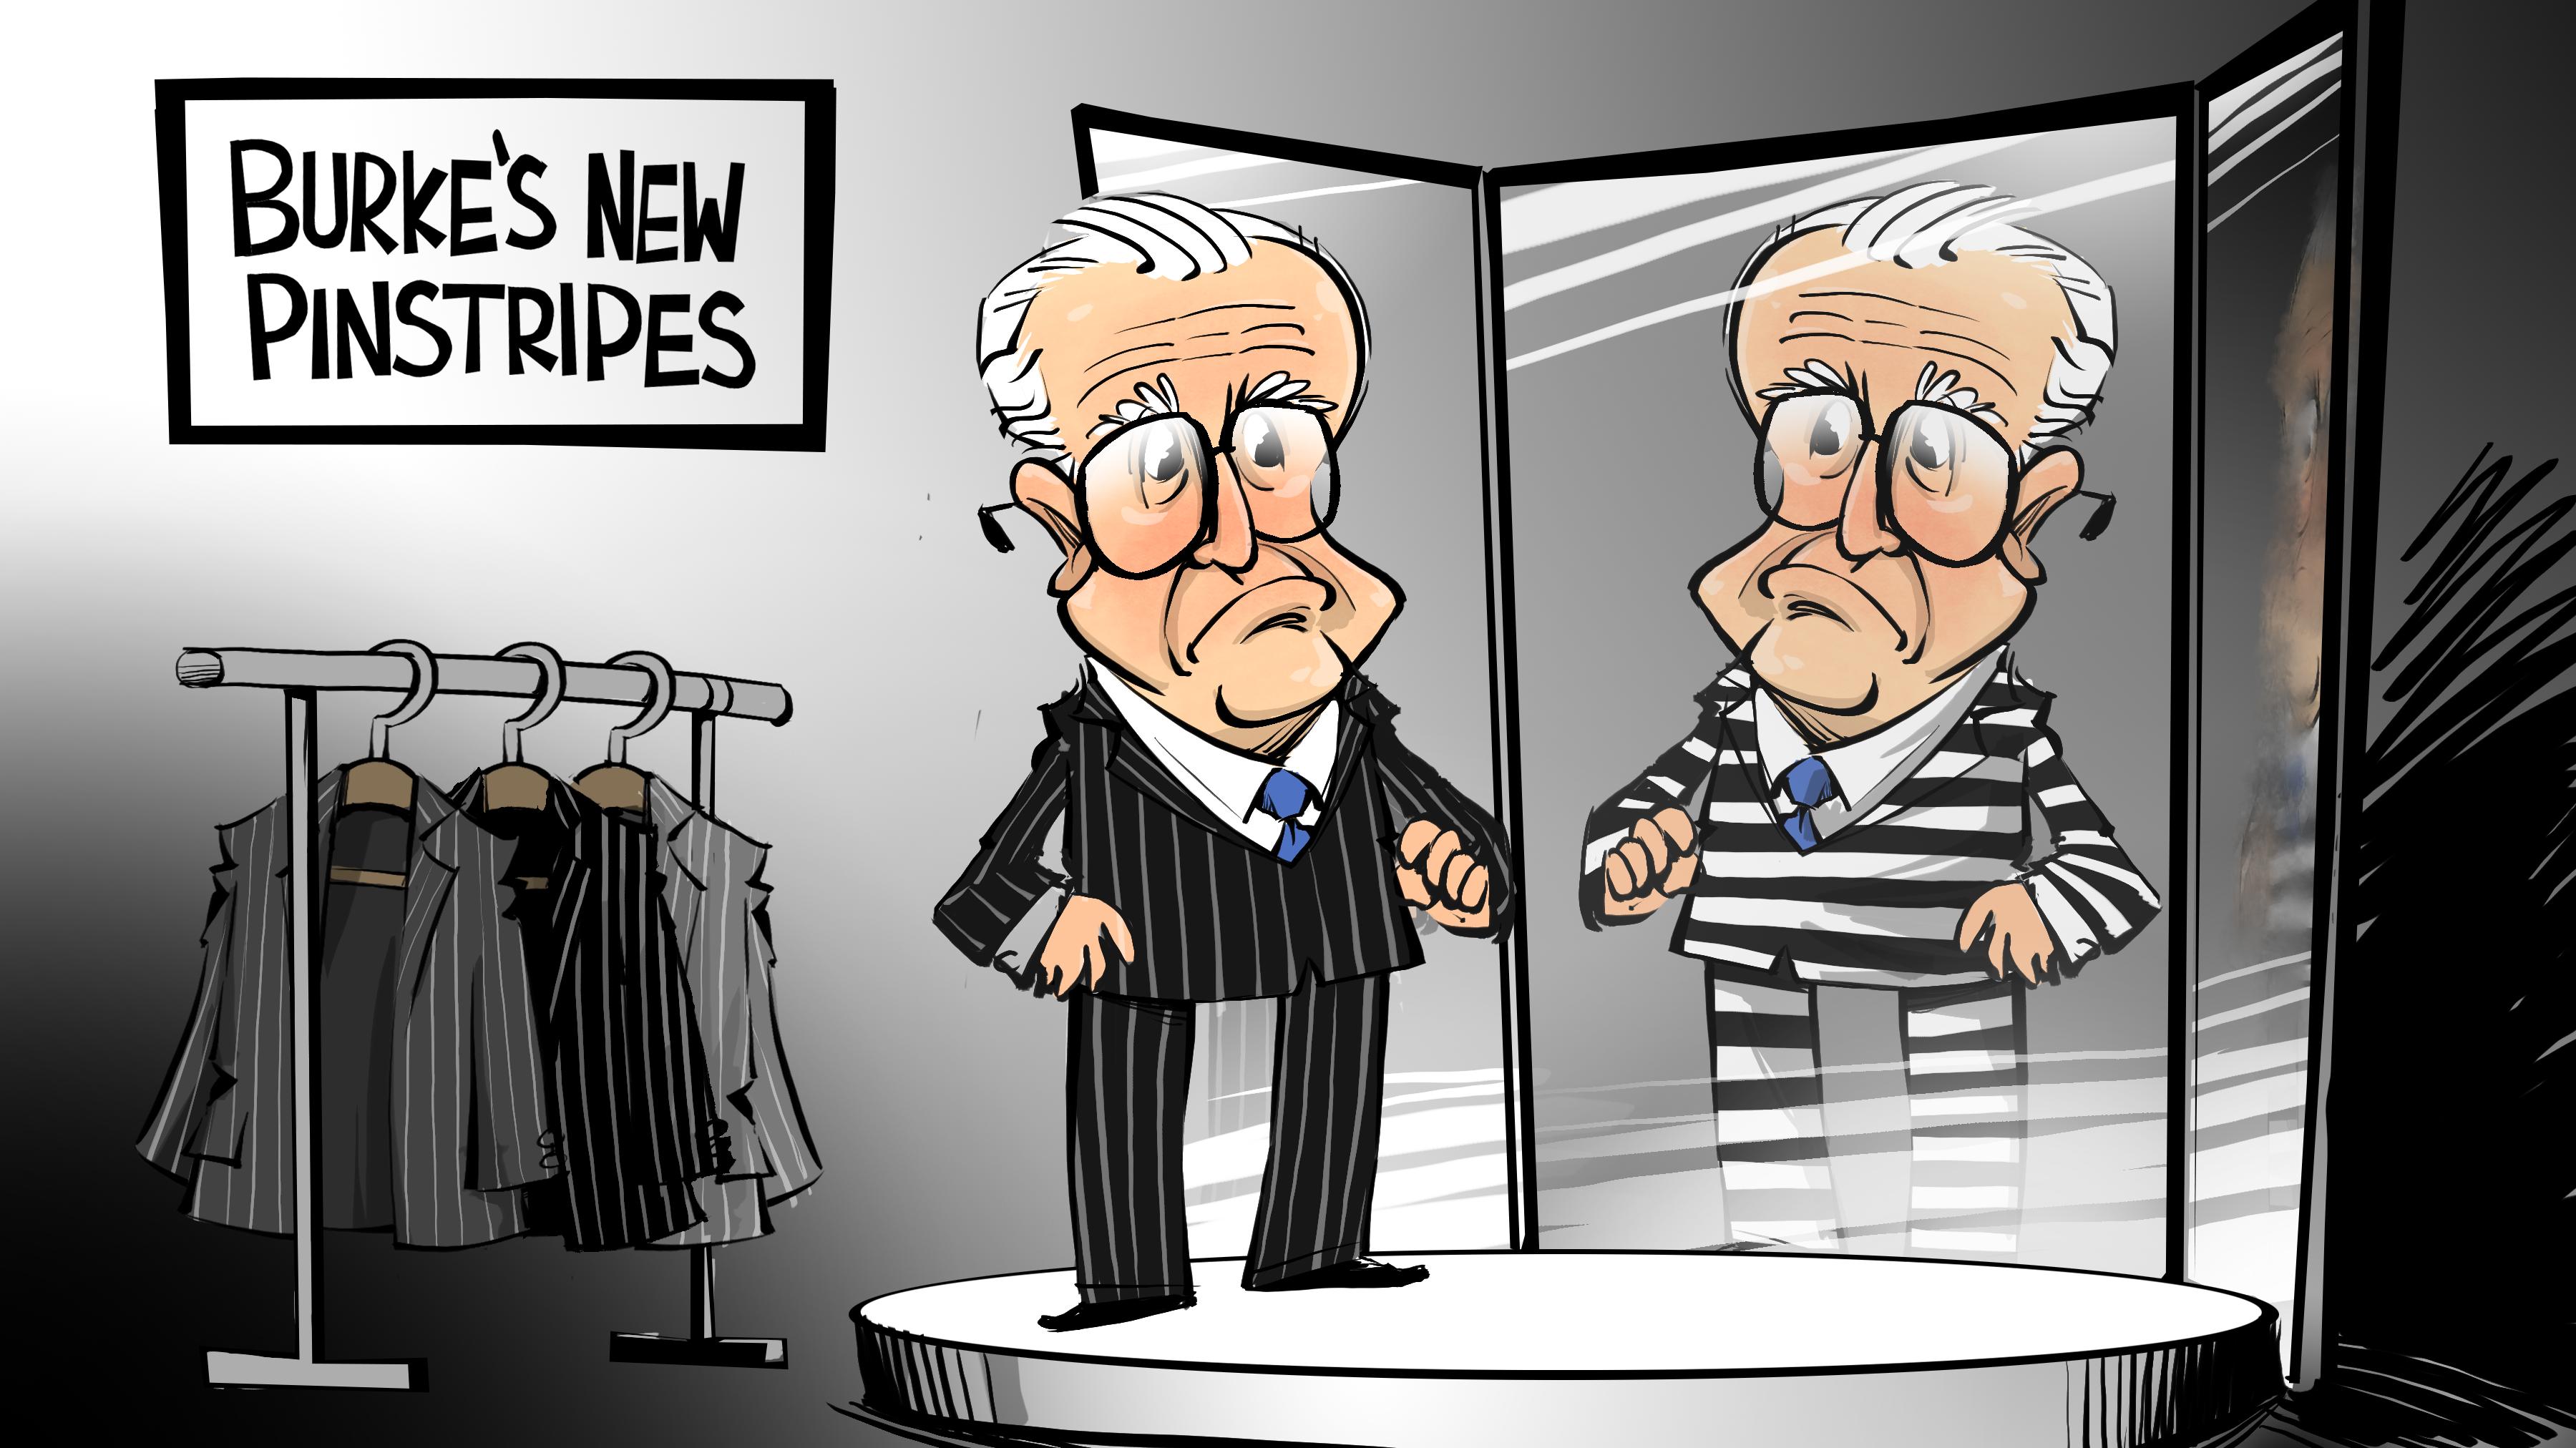 Ed Burke's new pinstripes